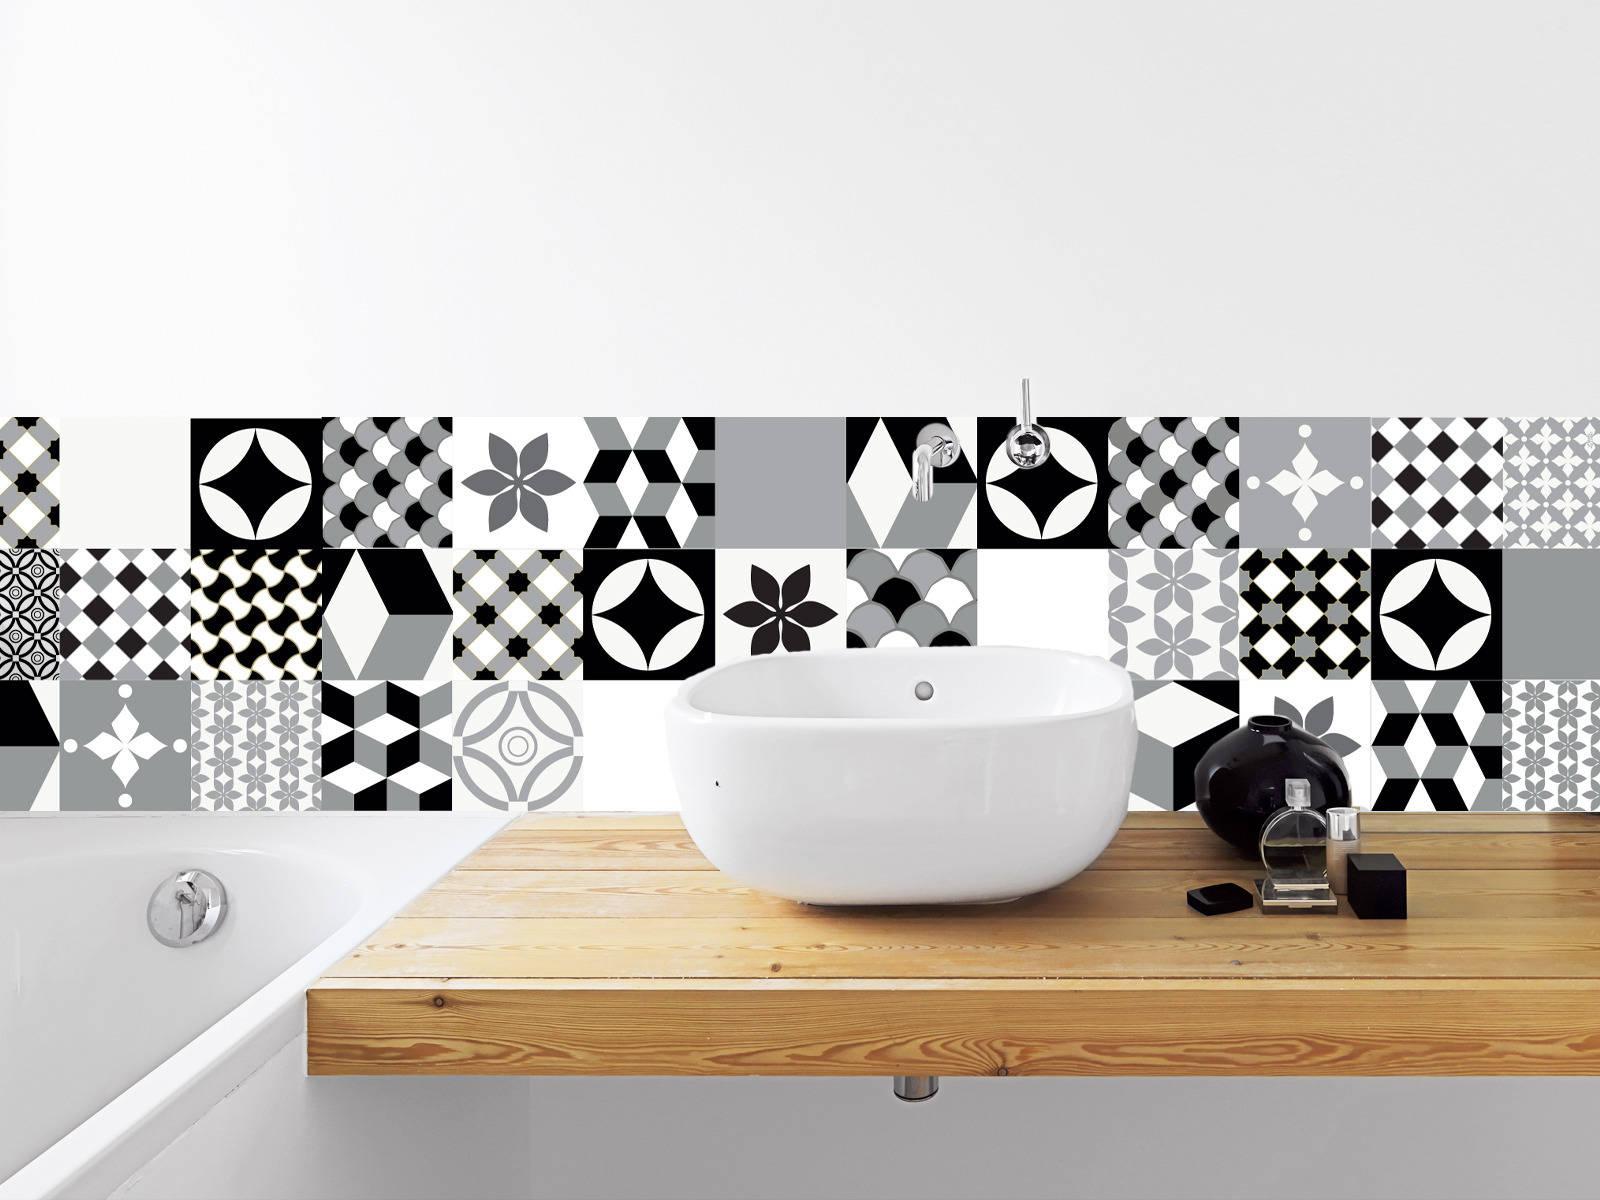 manufacture cr dence adh sive imperm abilis e. Black Bedroom Furniture Sets. Home Design Ideas